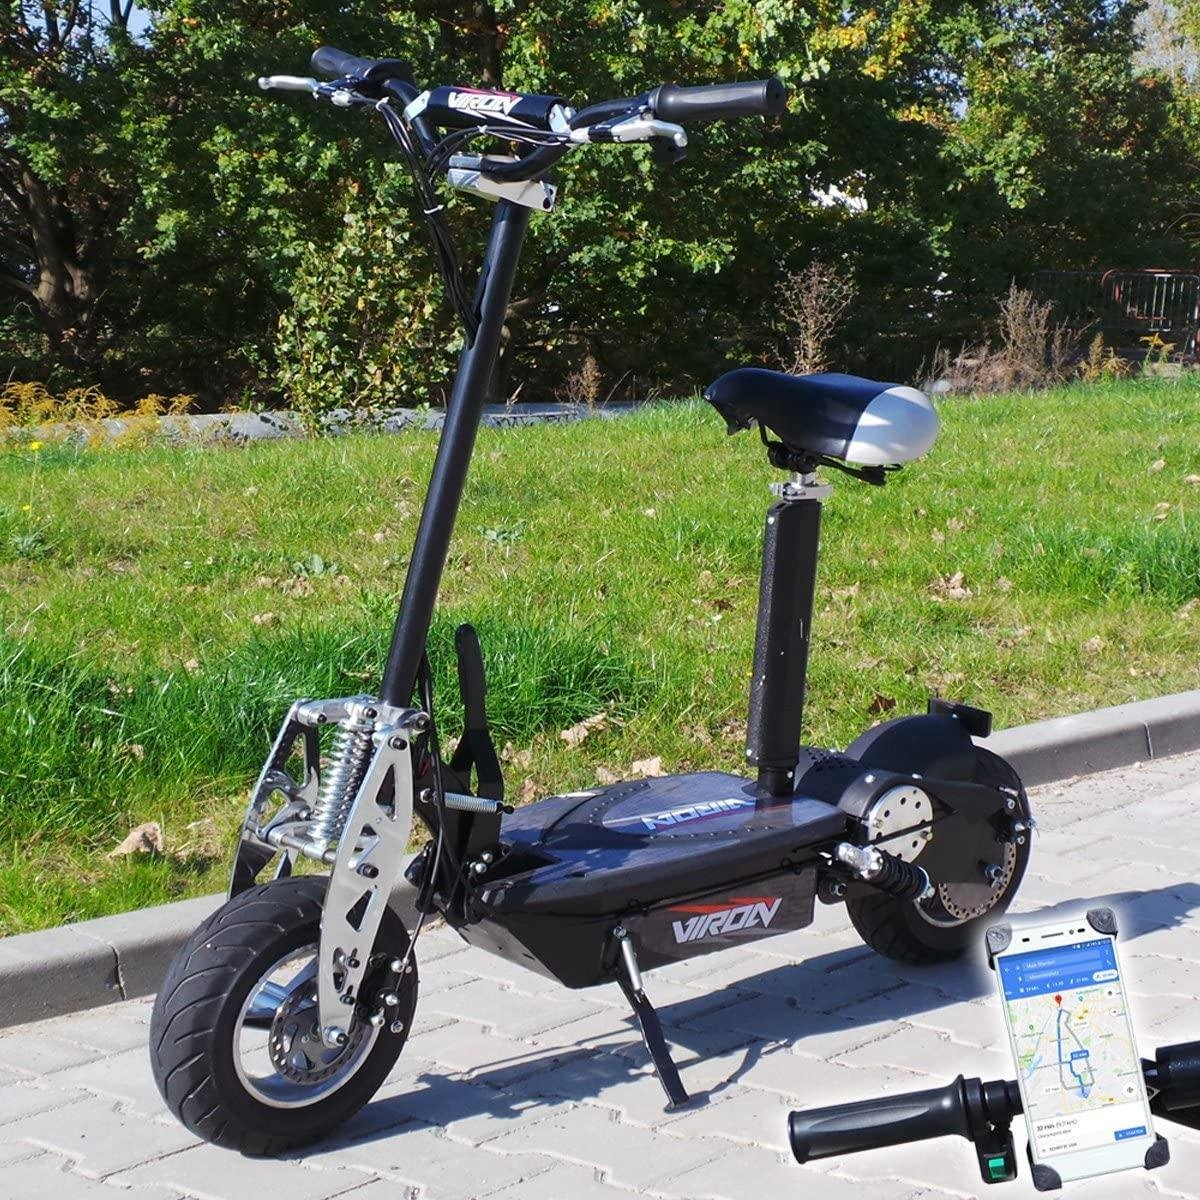 V.7 Elektro-scooter, Elektrische step, E-scooter, elektrische scooter, 800 watt, 36 V